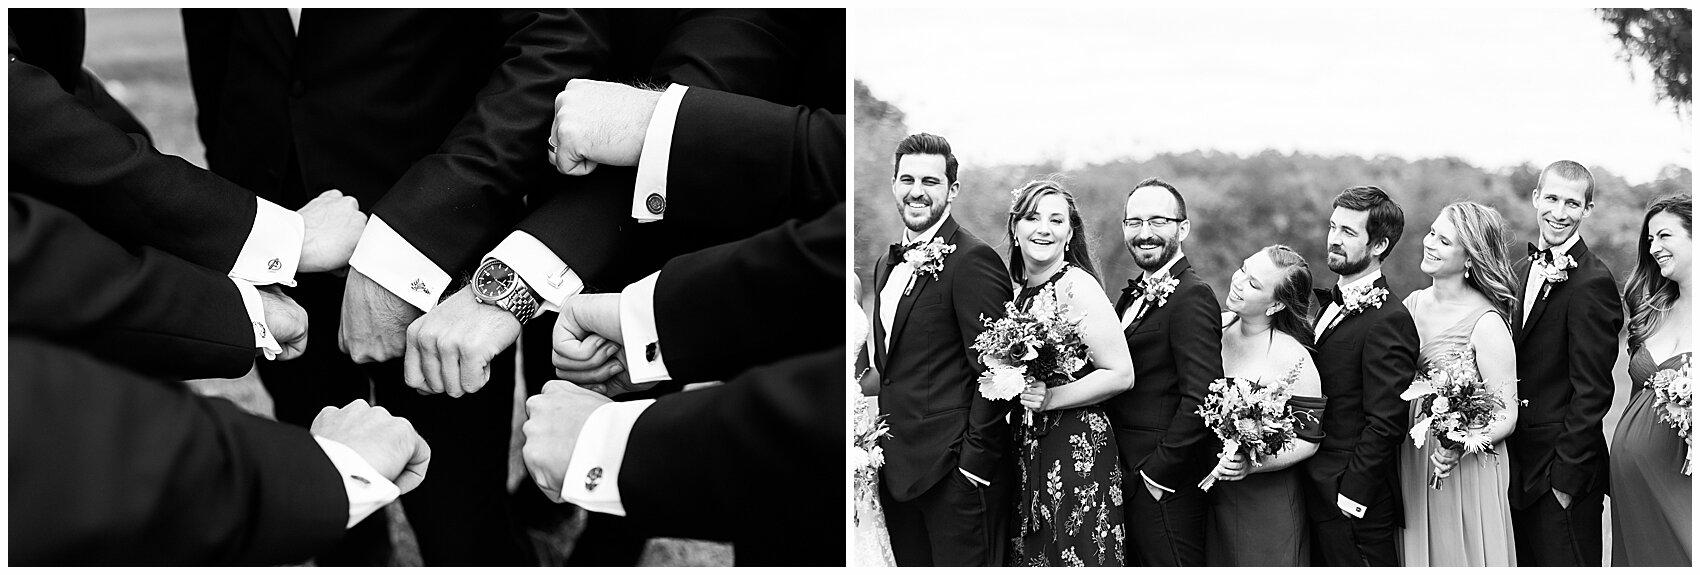 york-pa-wedding-photographer_0059.jpg